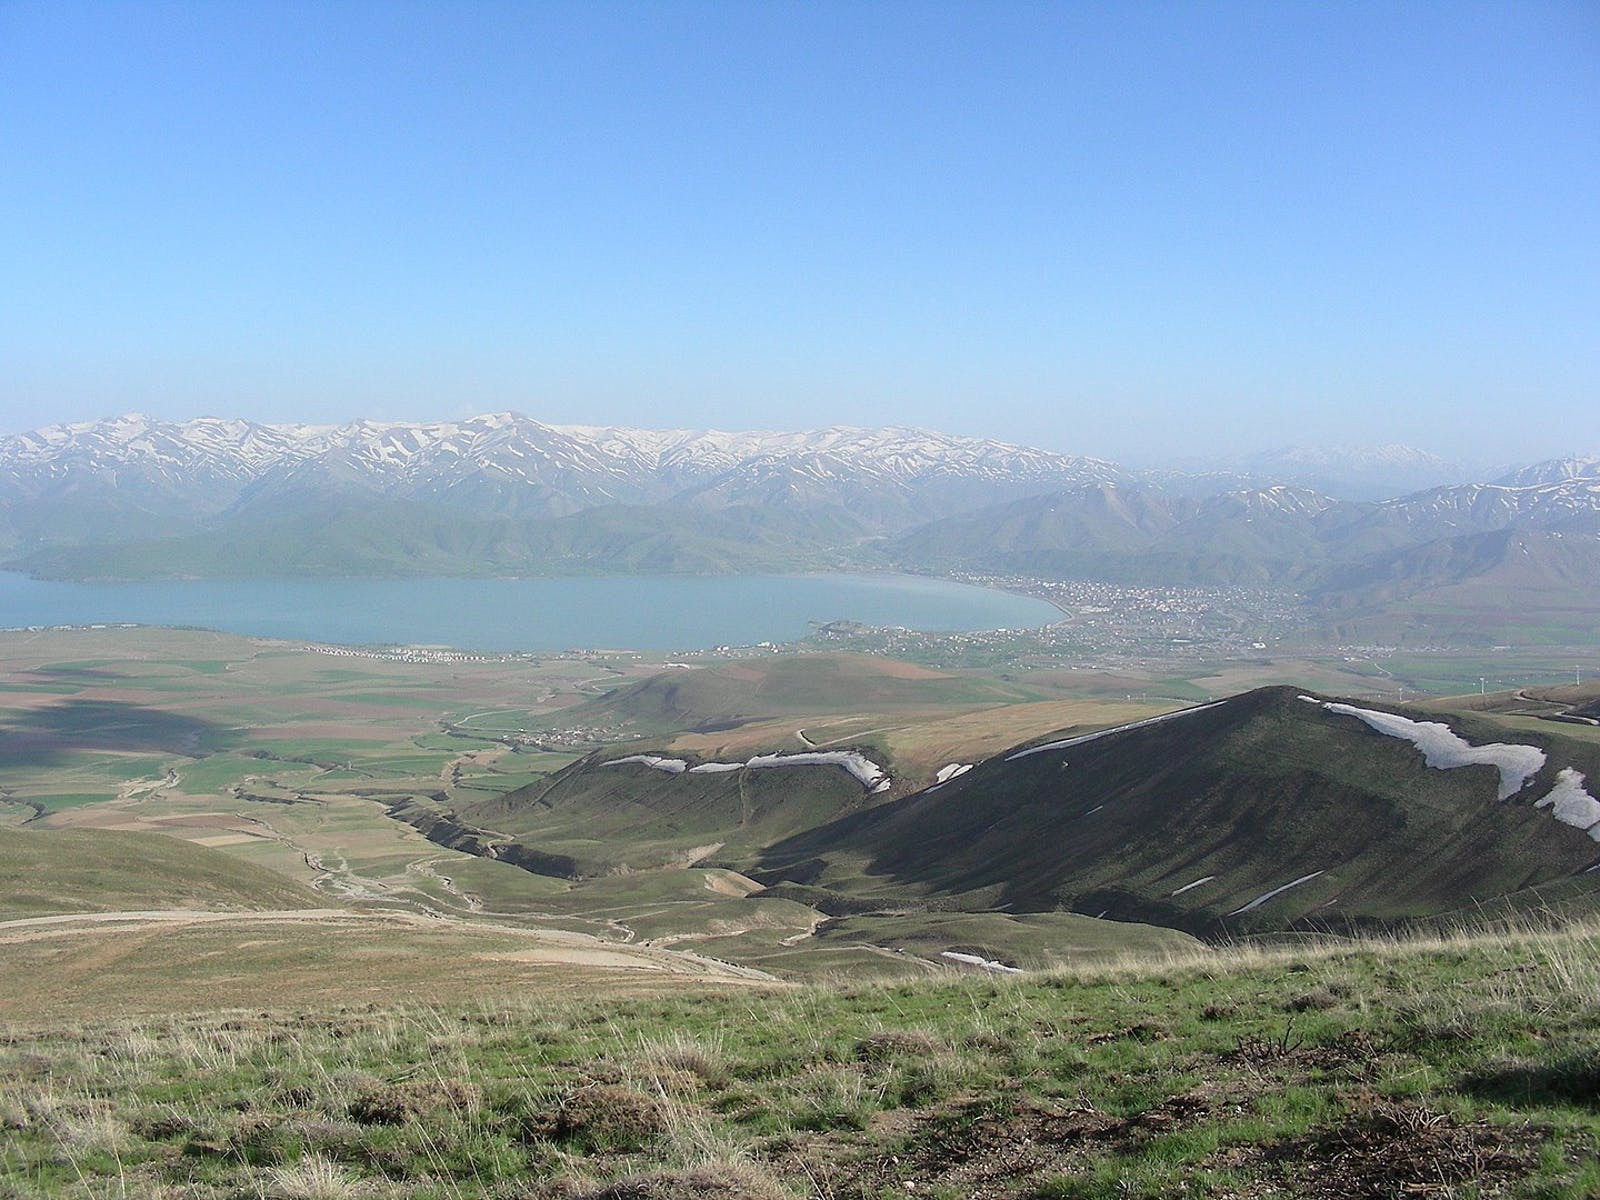 Eastern Anatolian Montane Steppe